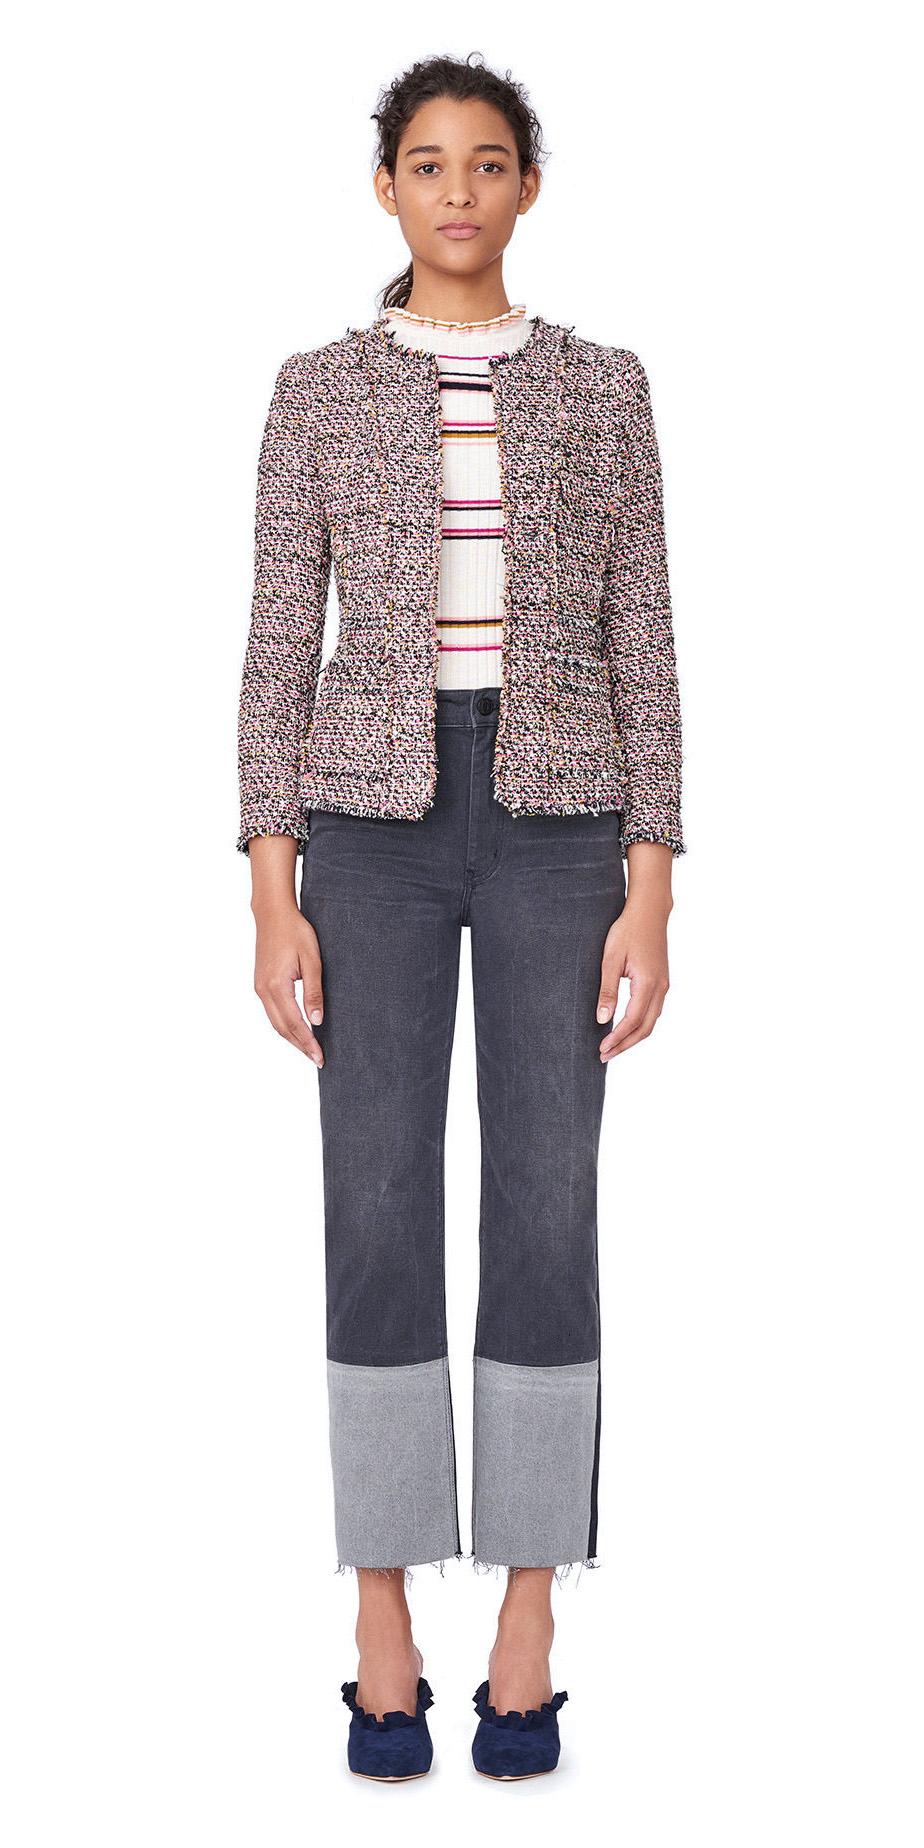 blue-navy-crop-jeans-brun-pony-blue-shoe-pumps-tweed-pink-light-jacket-lady-fall-winter-lunch.jpg